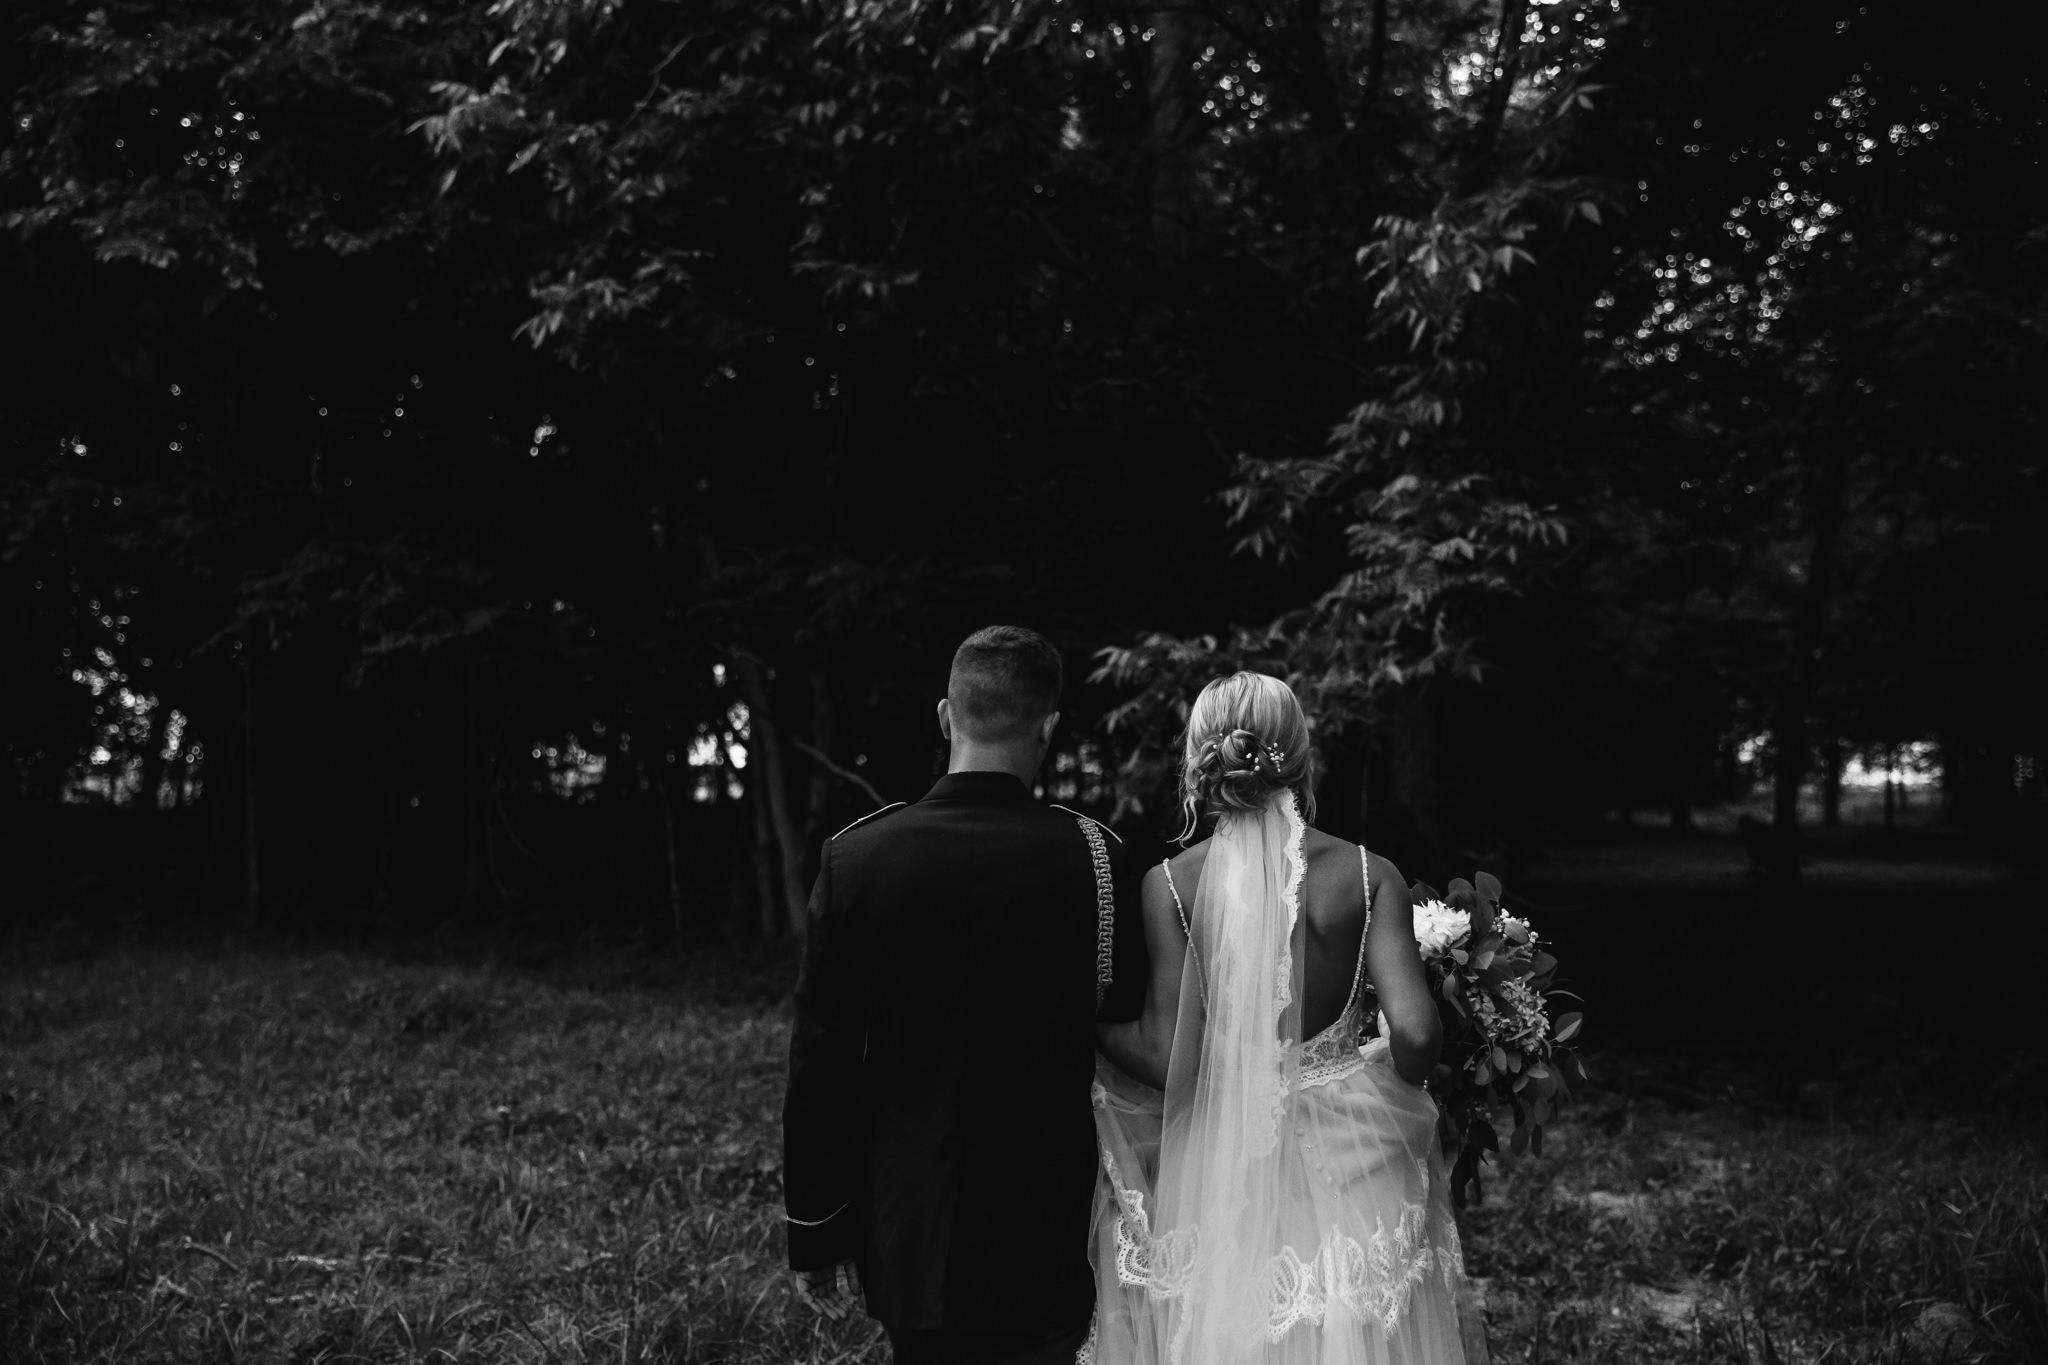 backyard-wedding-thewarmtharoundyou-lexy-branson-5-2.jpg